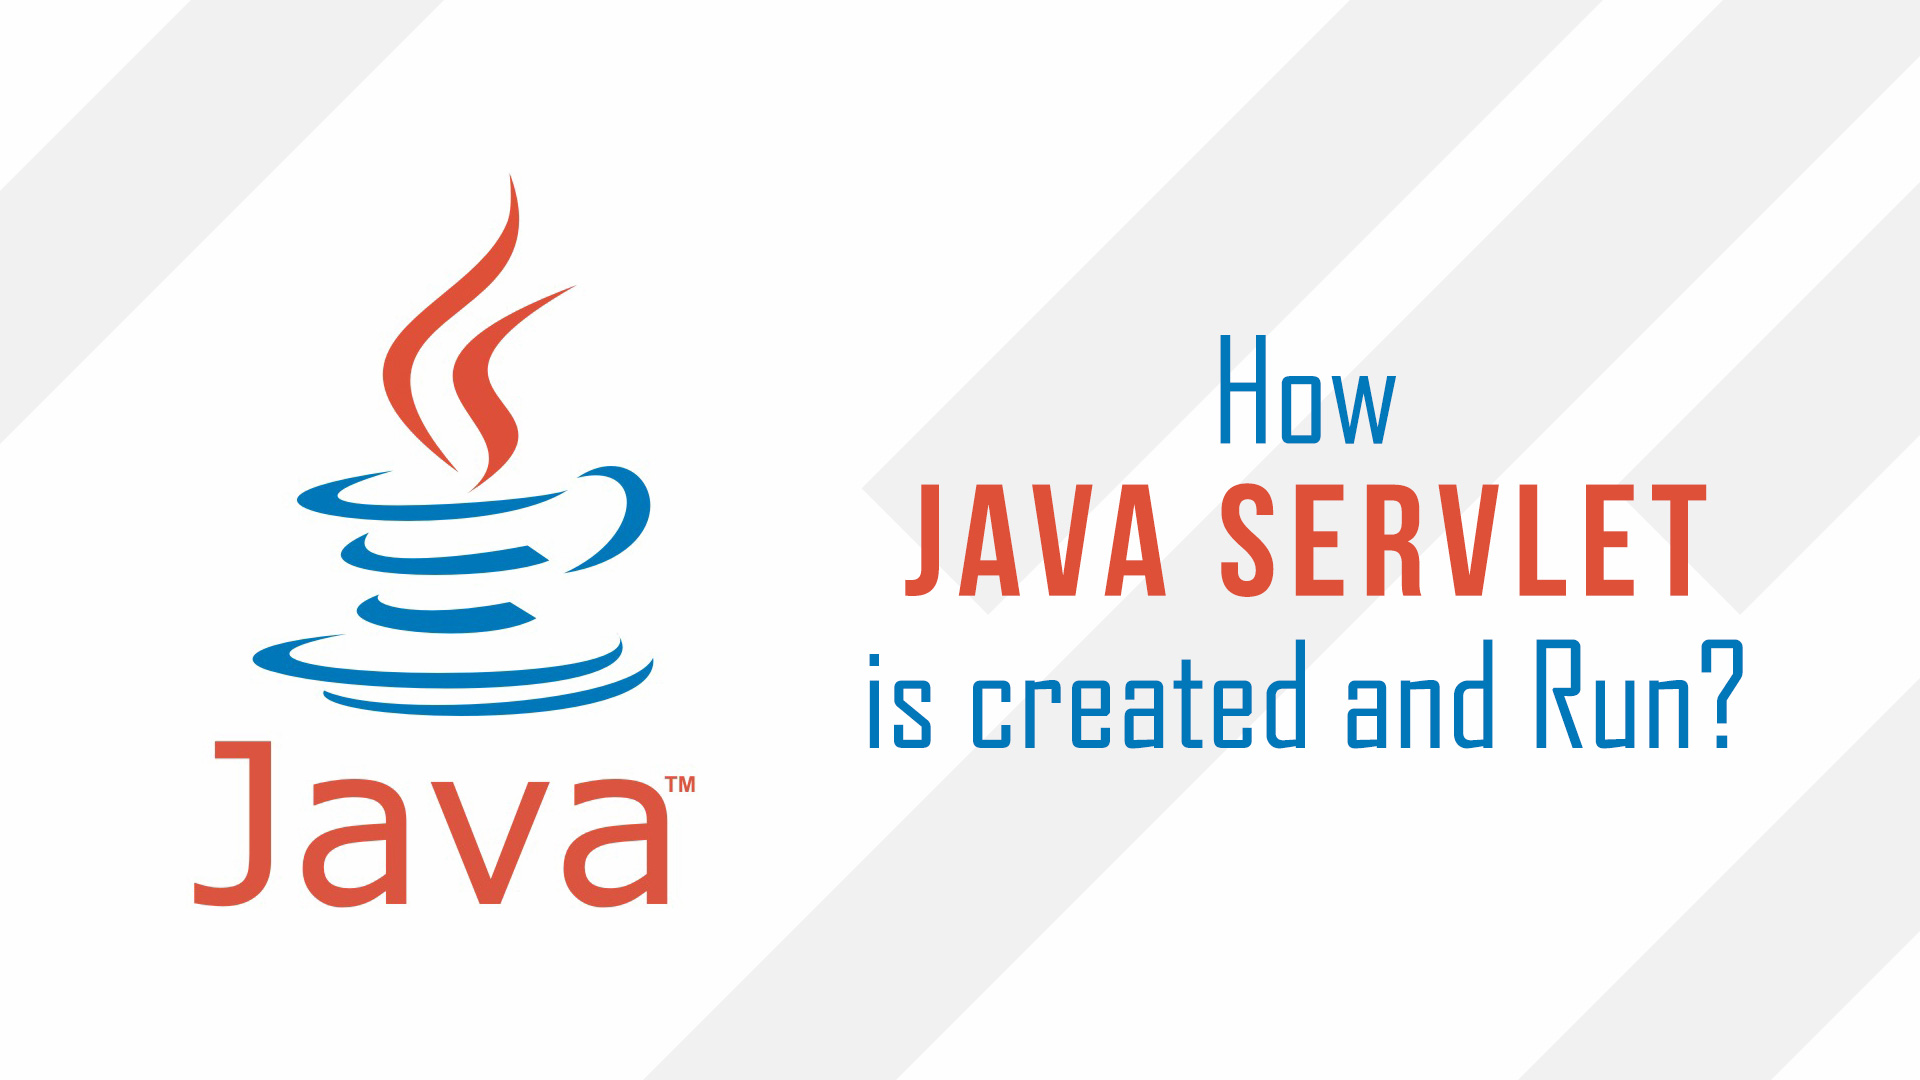 How java servlet is created and run loginworks softwares pvt ltd how java servlet is created and run baditri Images